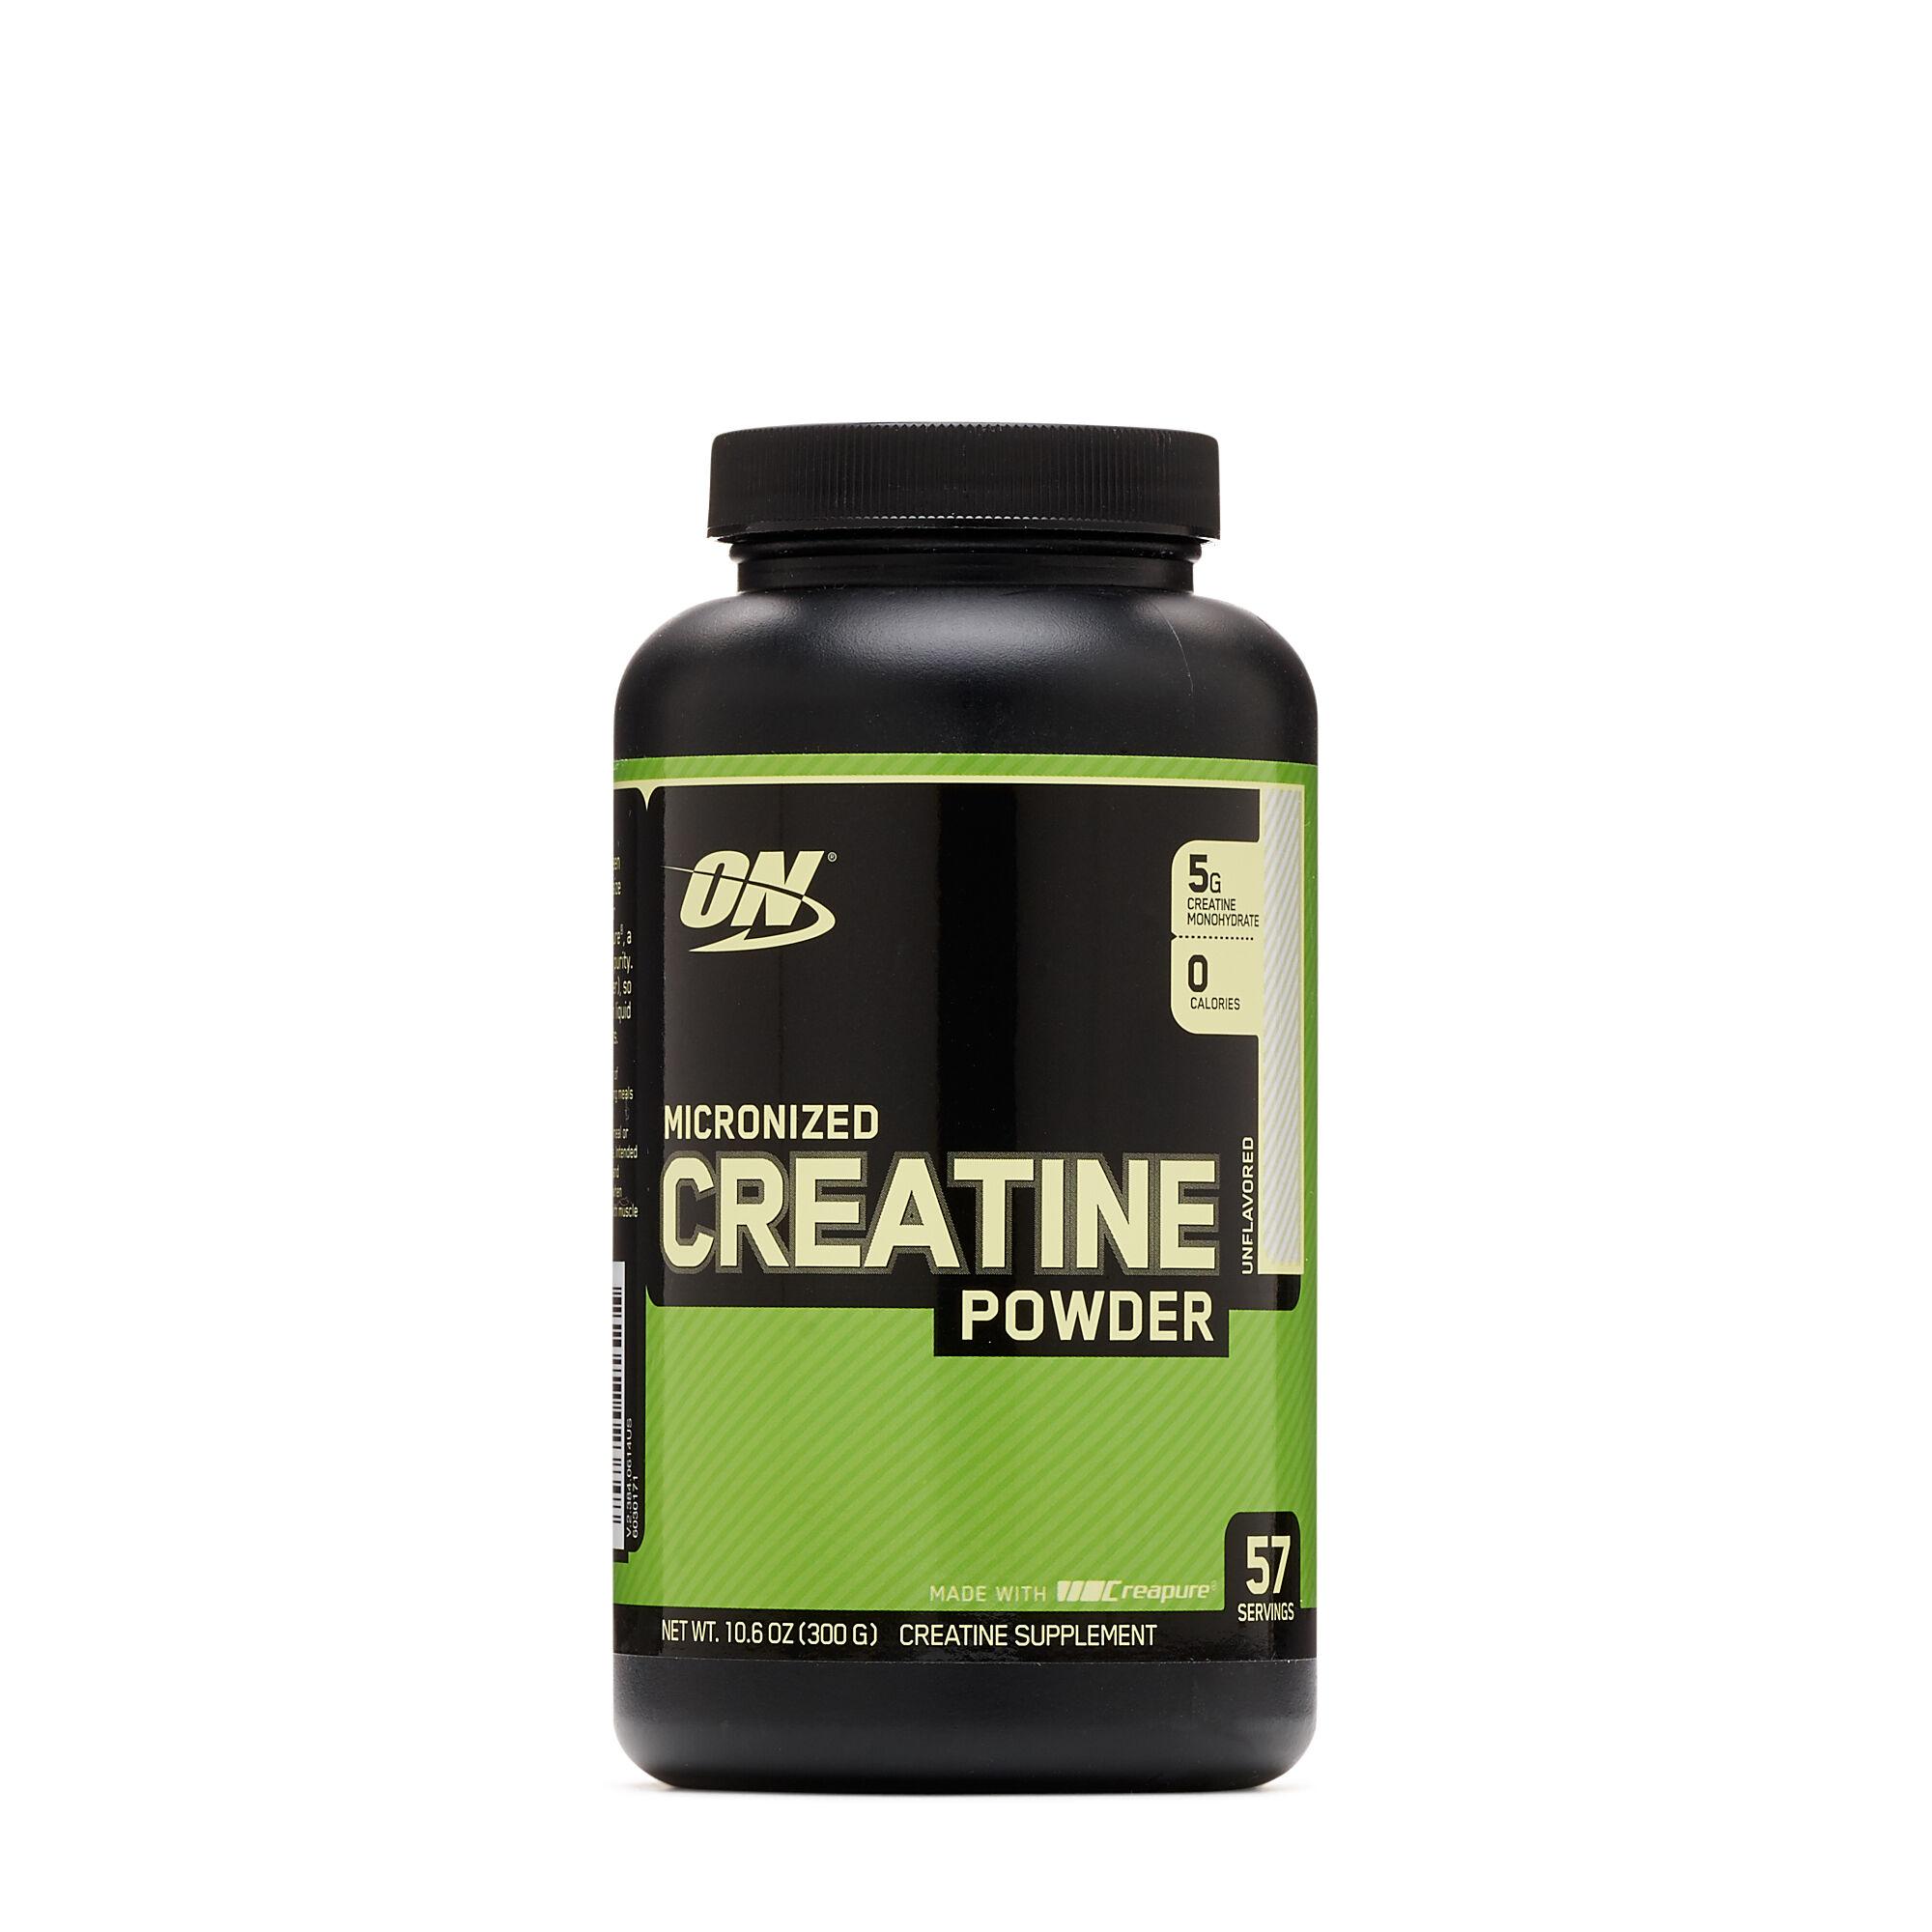 Will creatine make me bigger